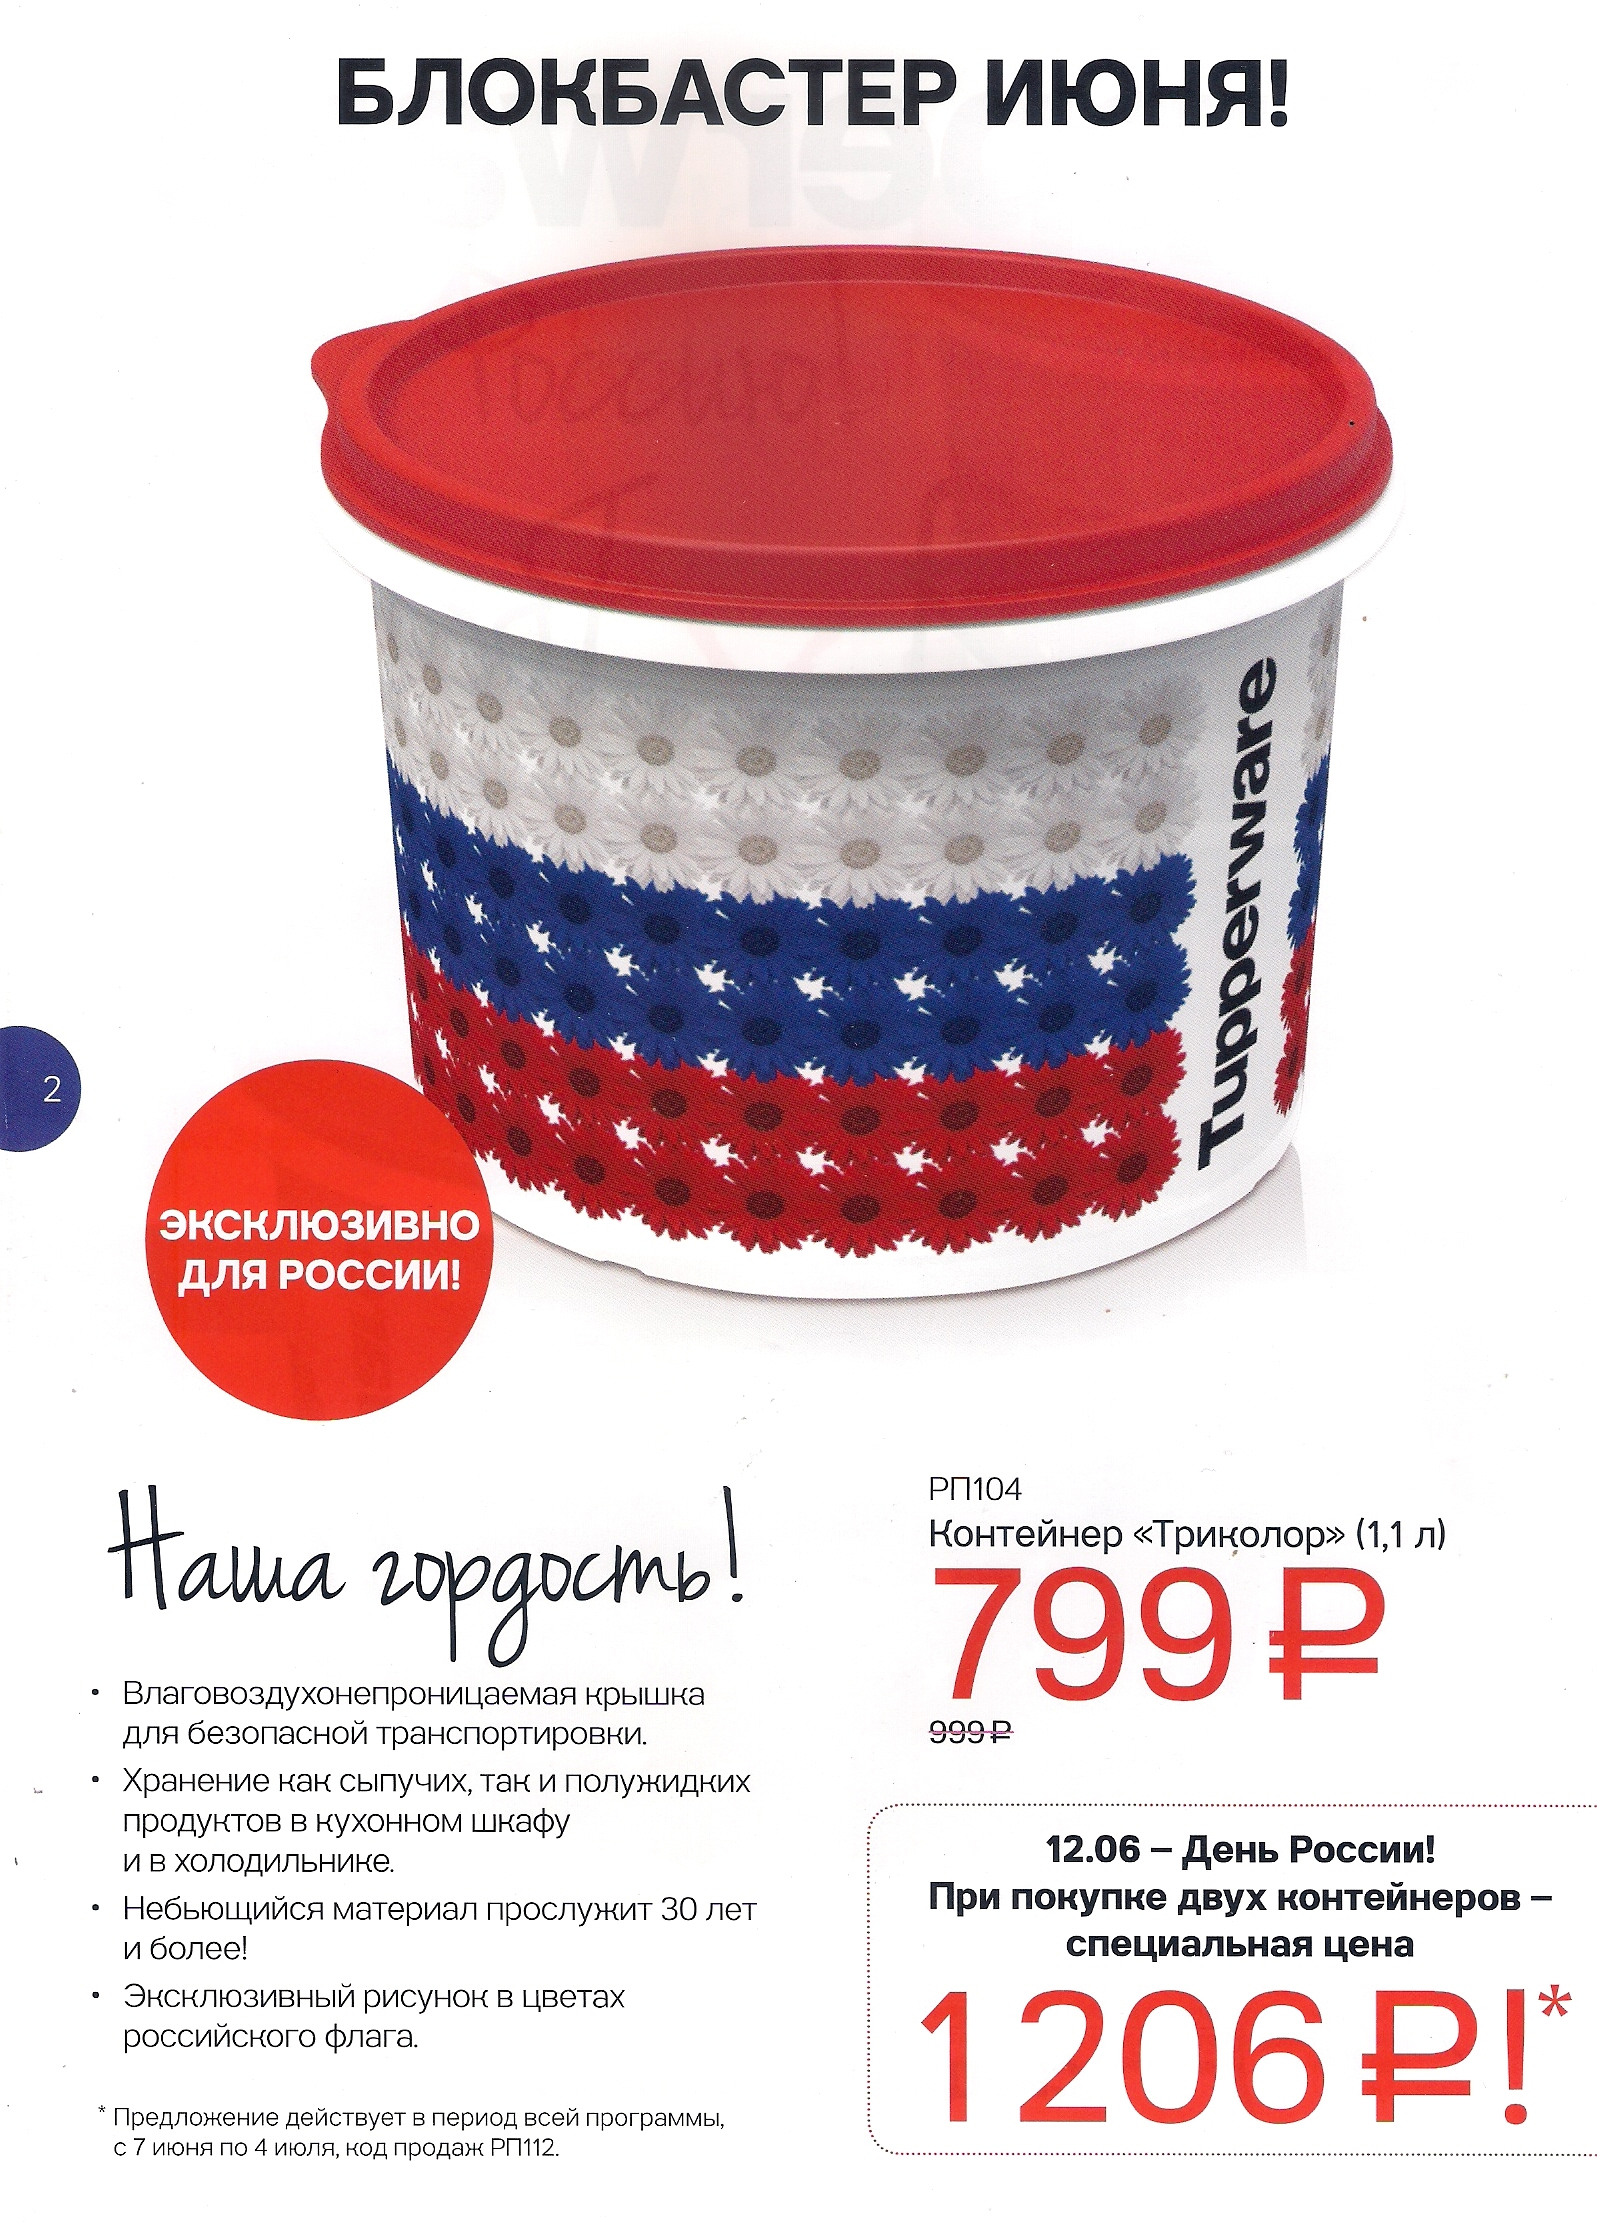 http://tupperware-online.ru/images/upload/2l.jpg